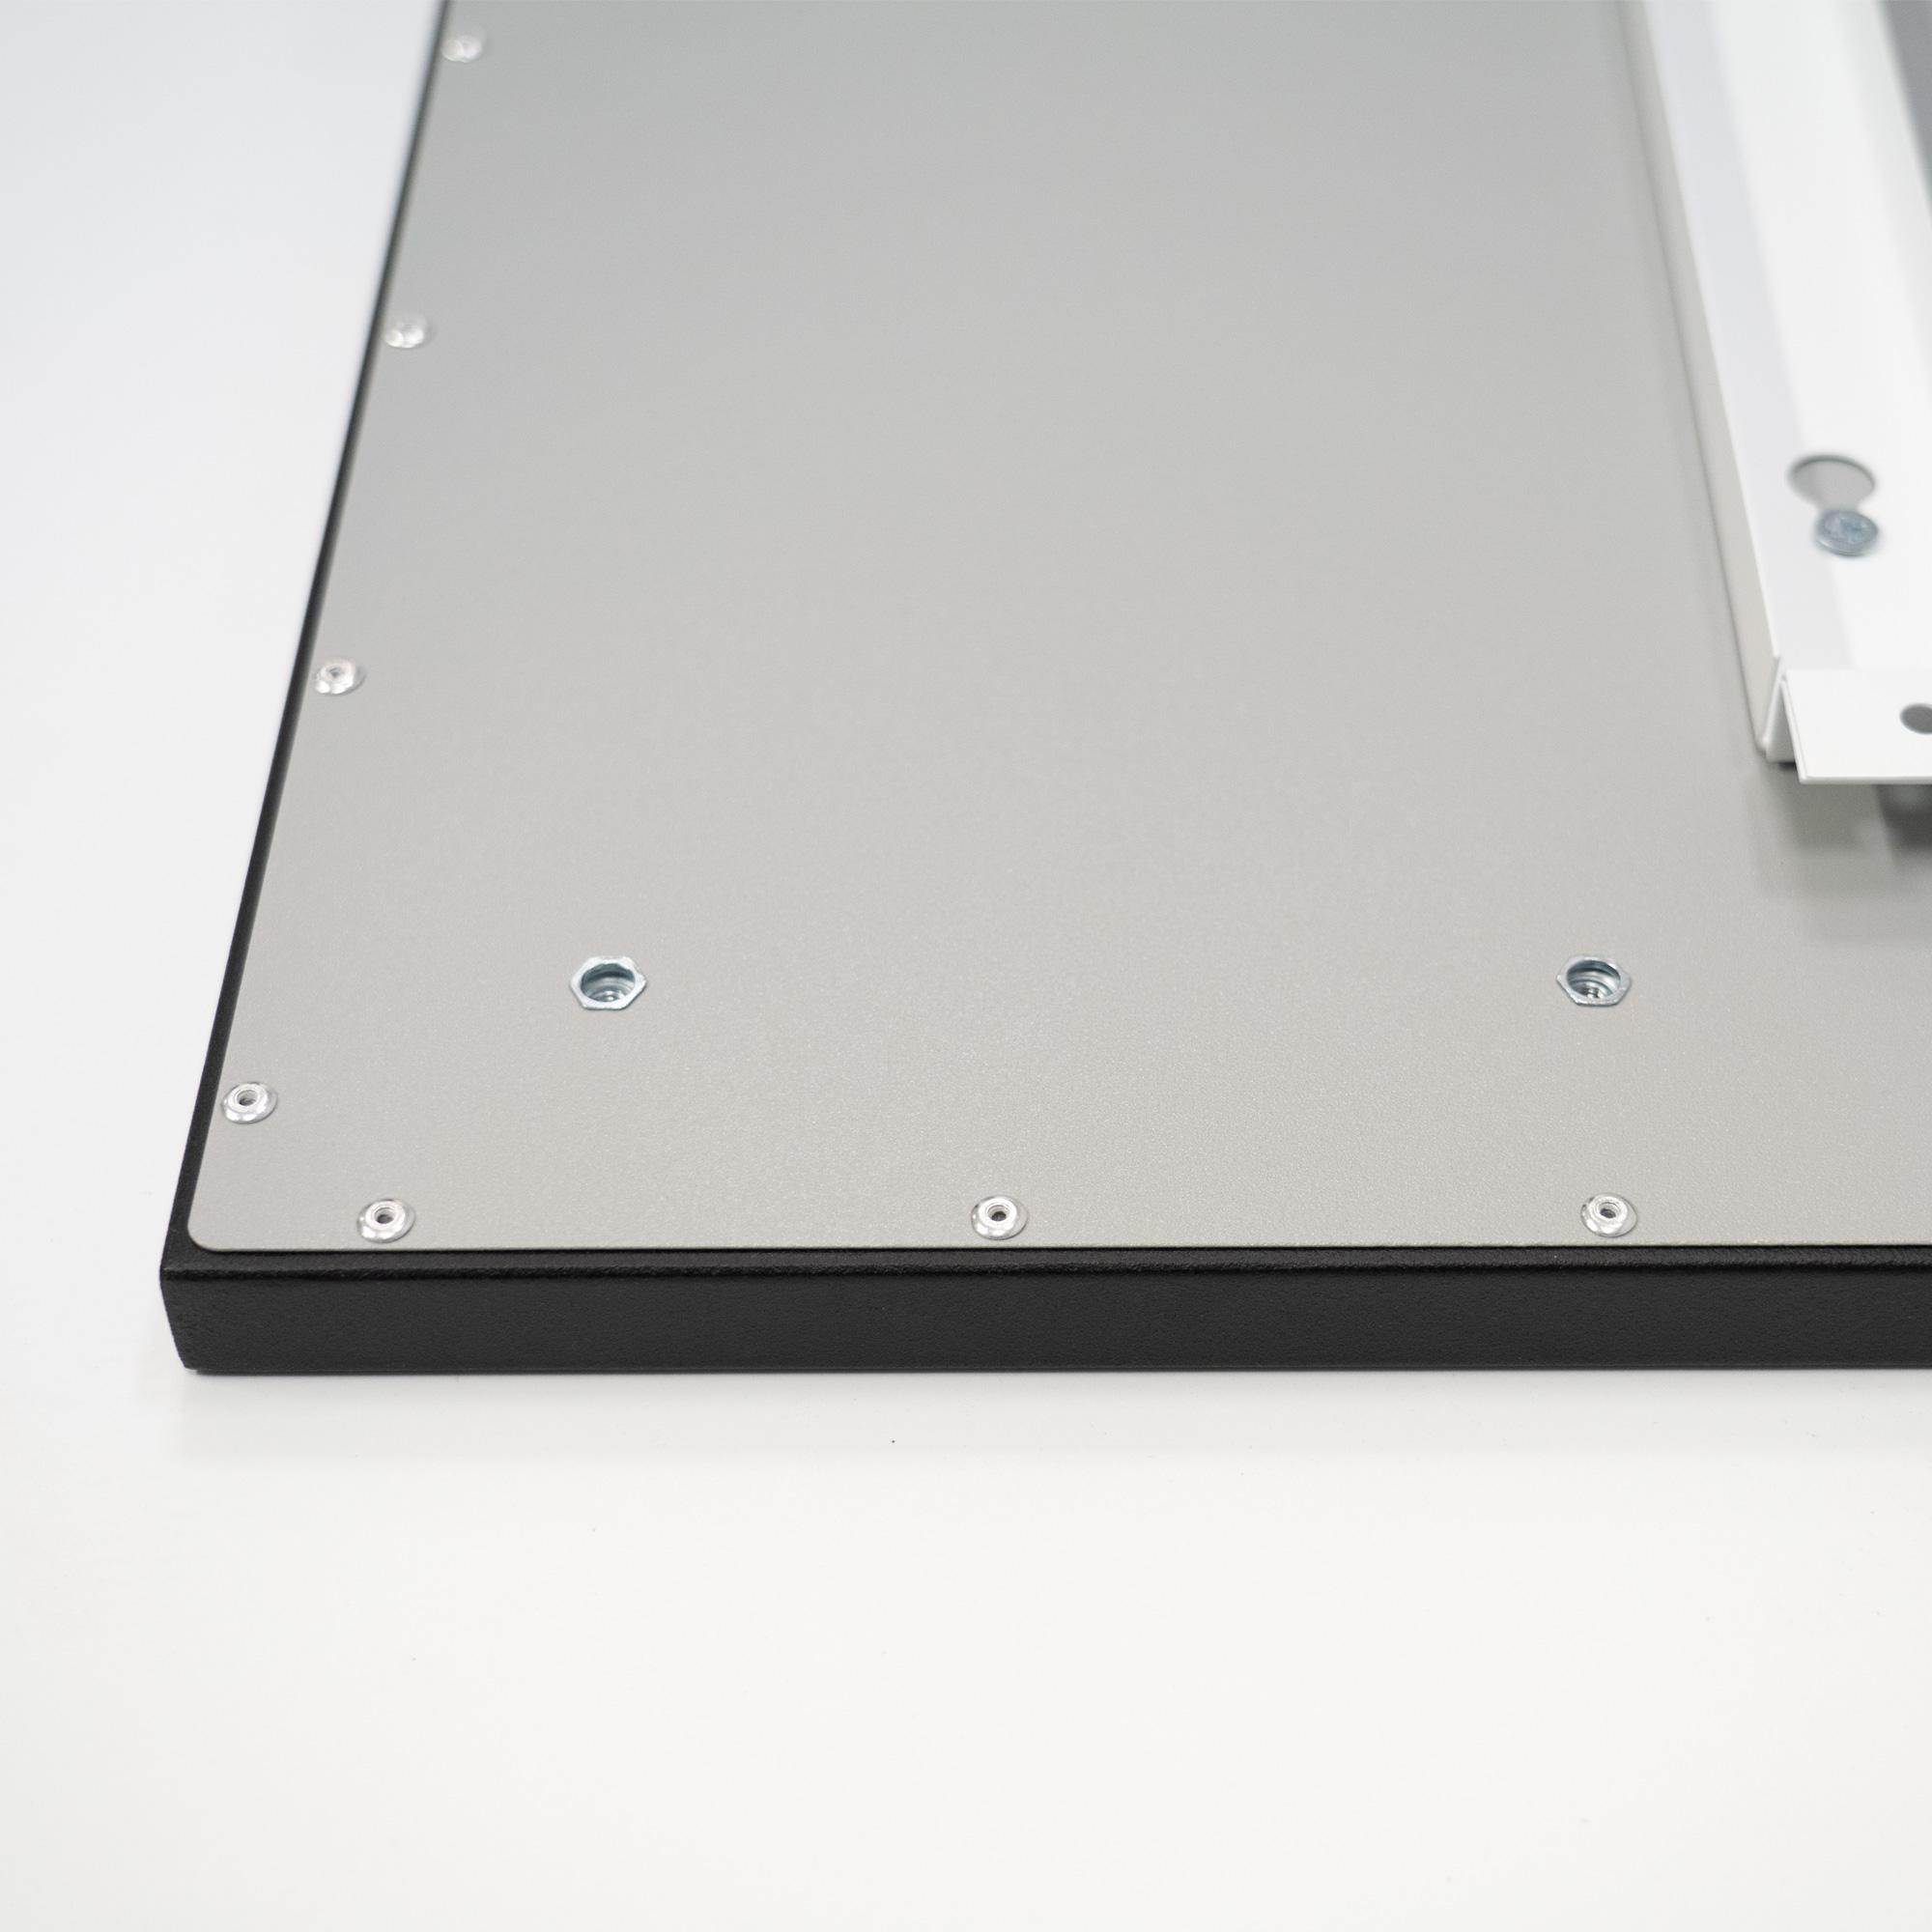 Infrarotheizung Tafel mit Citara Handtuchstangen kompatibel